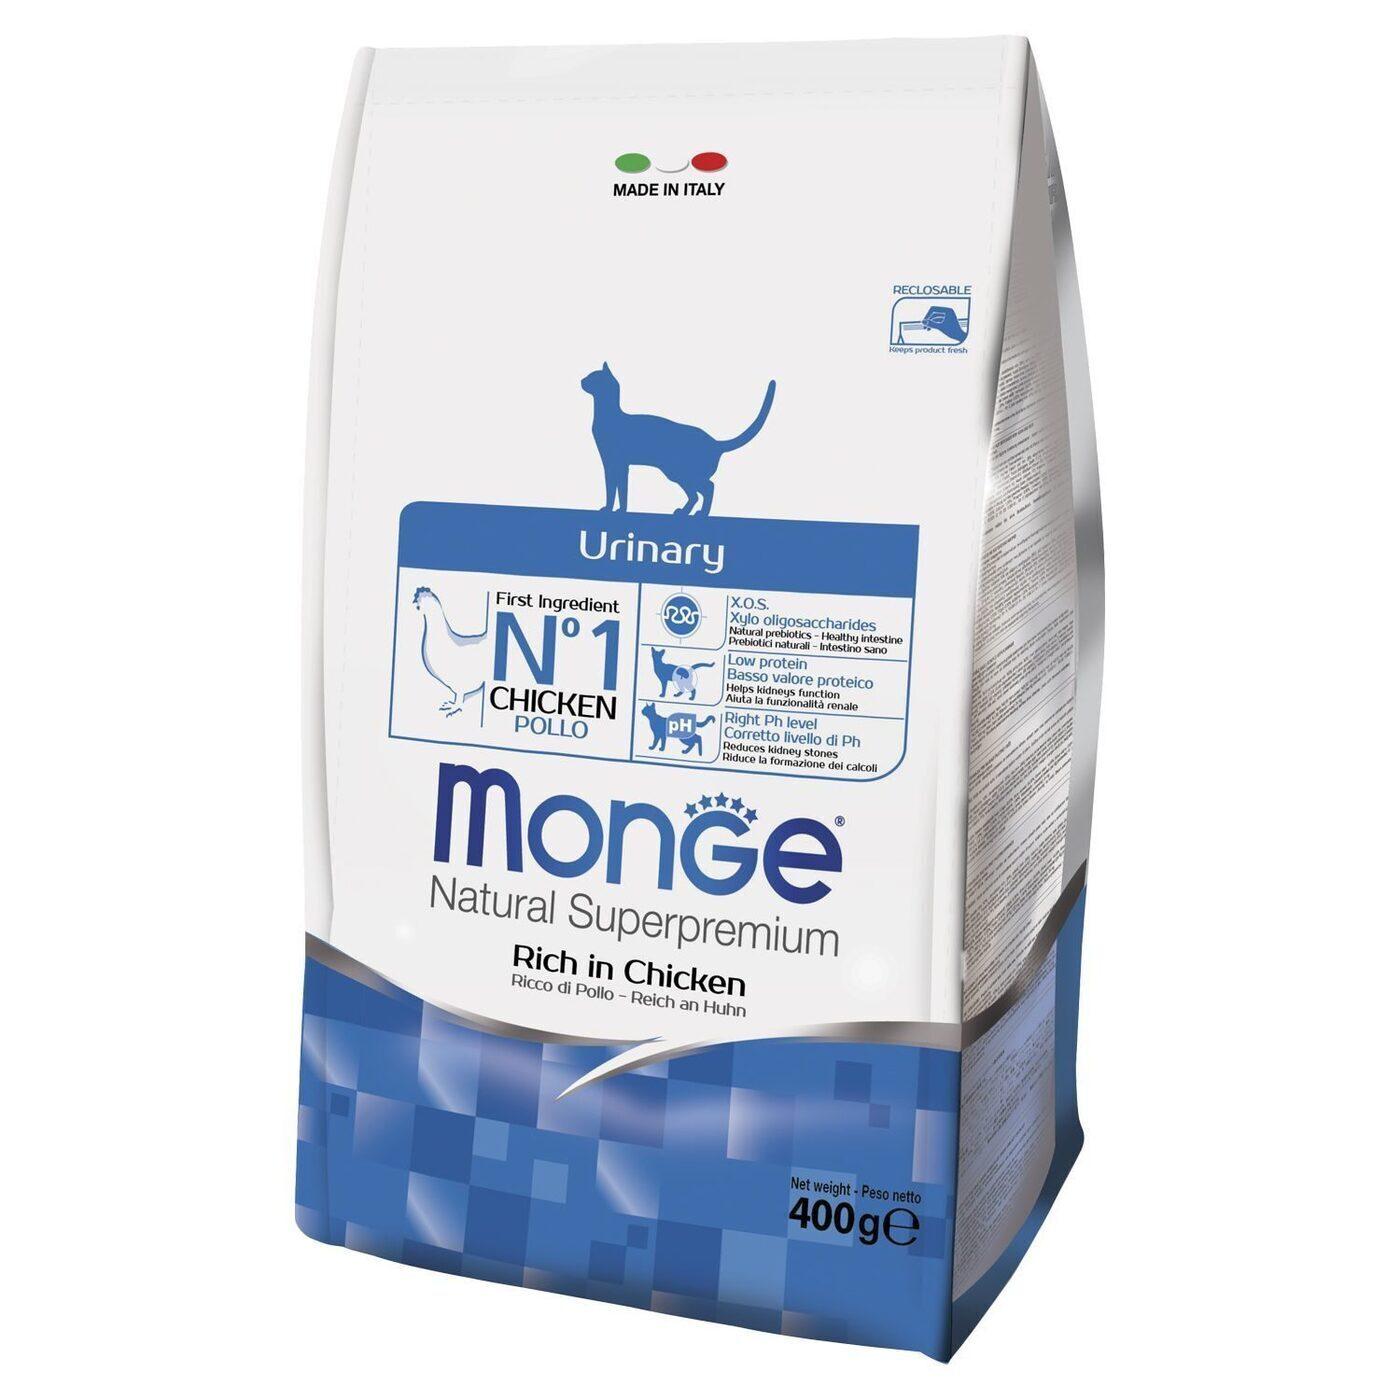 Monge Cat Urinary корм для кошек всех возрастов и пород, профилактика МКБ, курица и рис 400 гр, 900100816